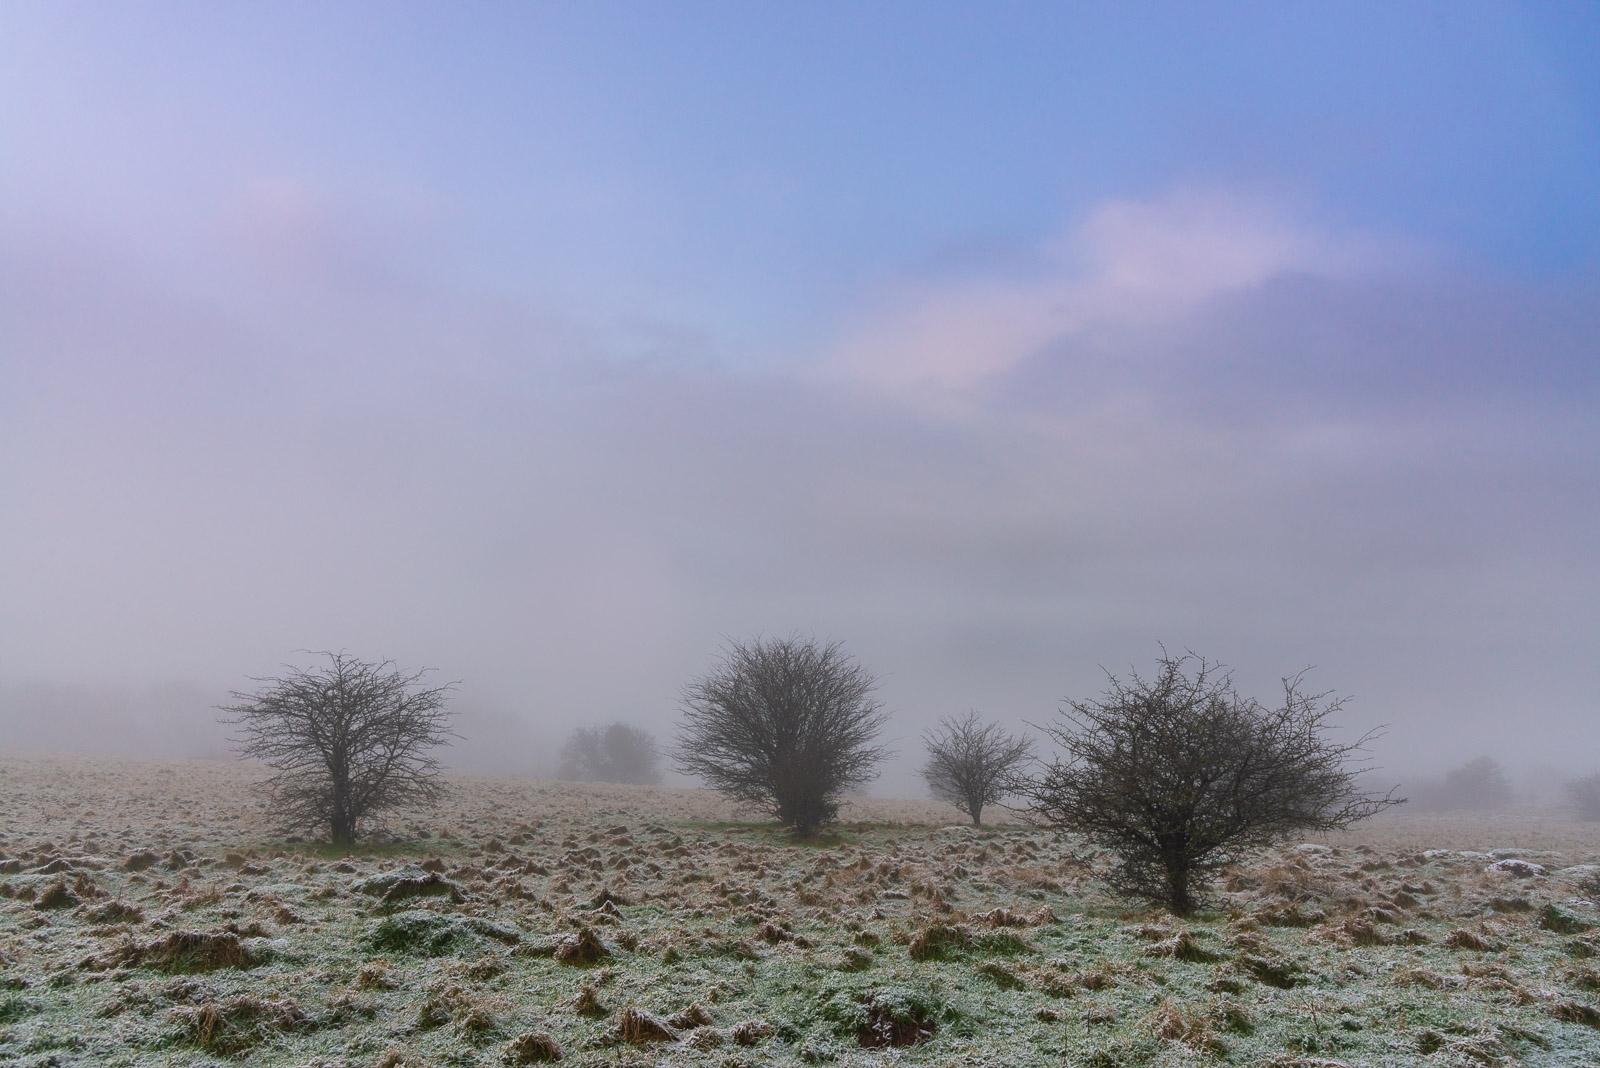 Dearleap - Mendip Hills, Somerset, UK. ID JB1_1107